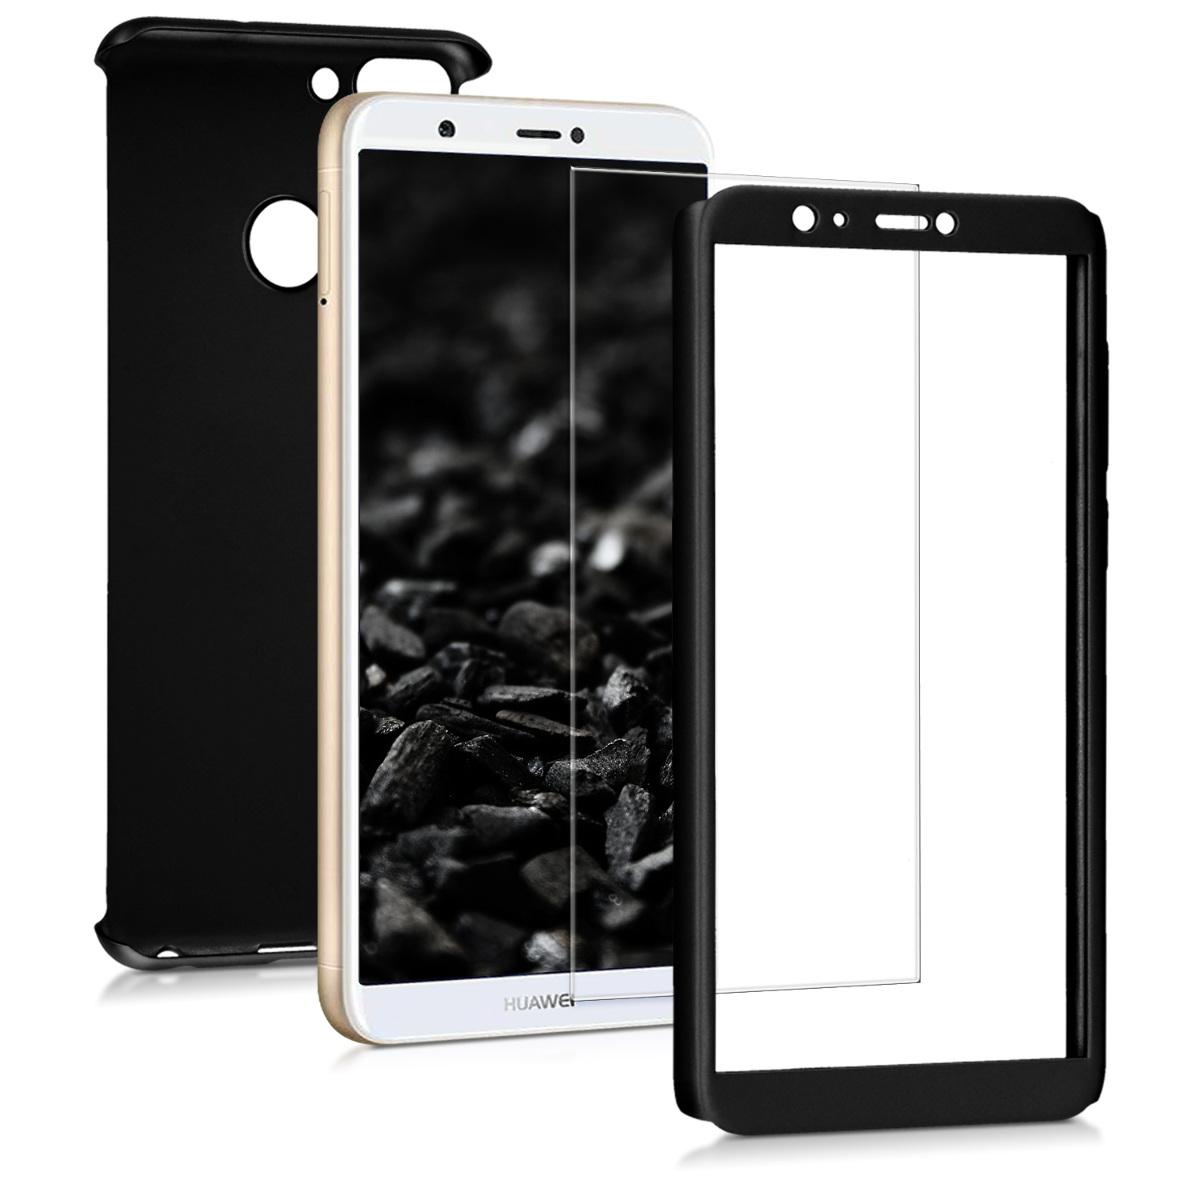 KW Θήκη Full Body Huawei  P Smart 2018 & Tempered Glass - Metallic Black (45559.68)